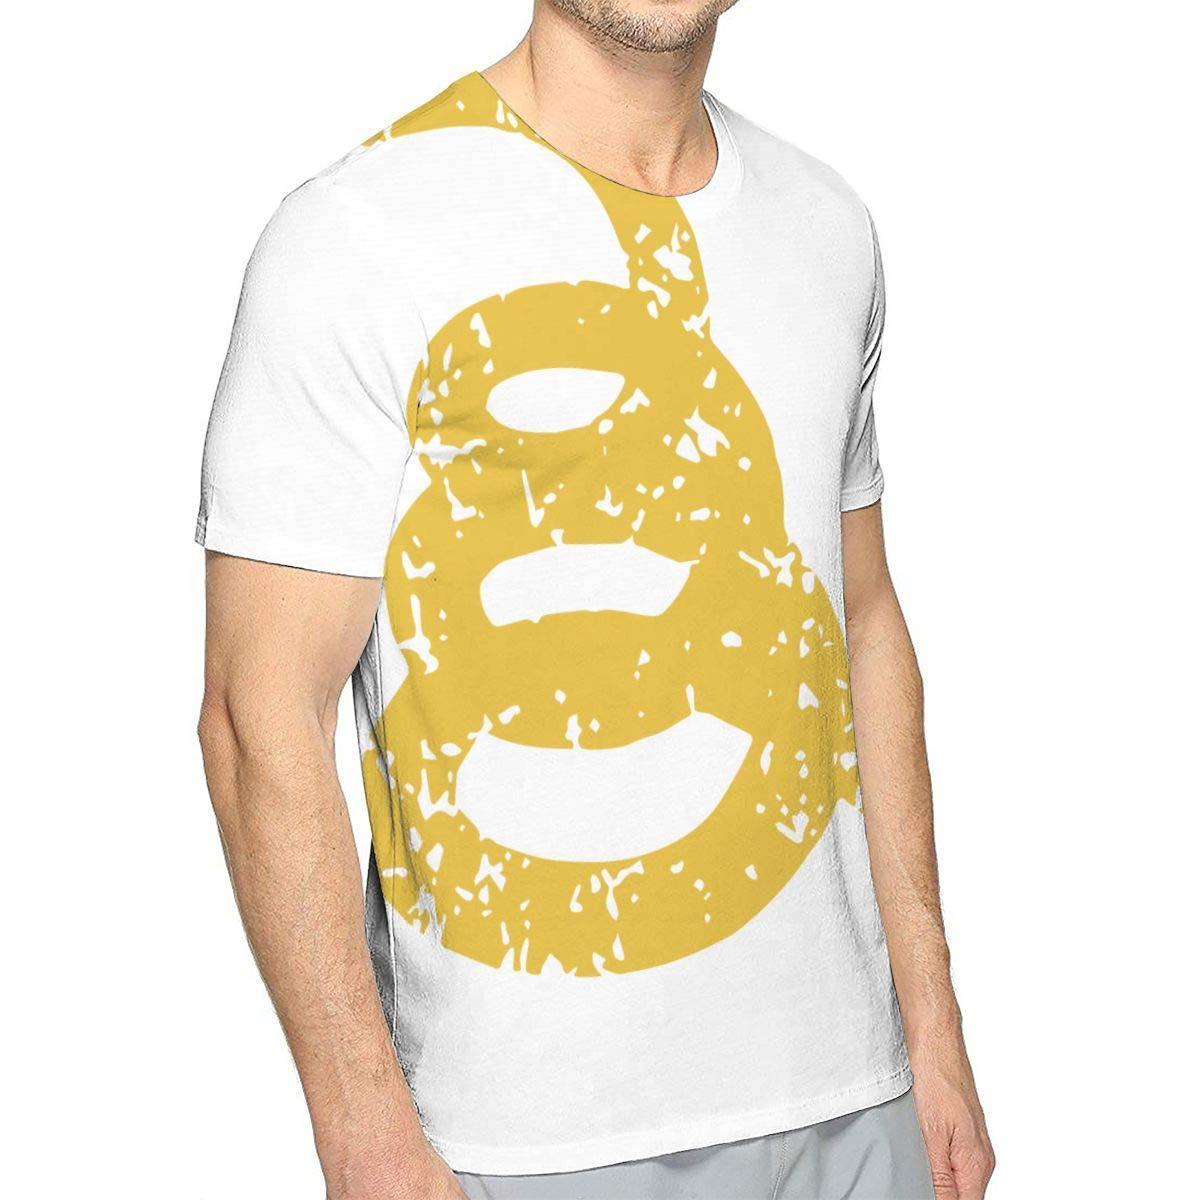 MNKAM Vintage Dont Tread On Me Fan Ultra Cotton Crewneck Vintage Short Sleeve Adult Shirt